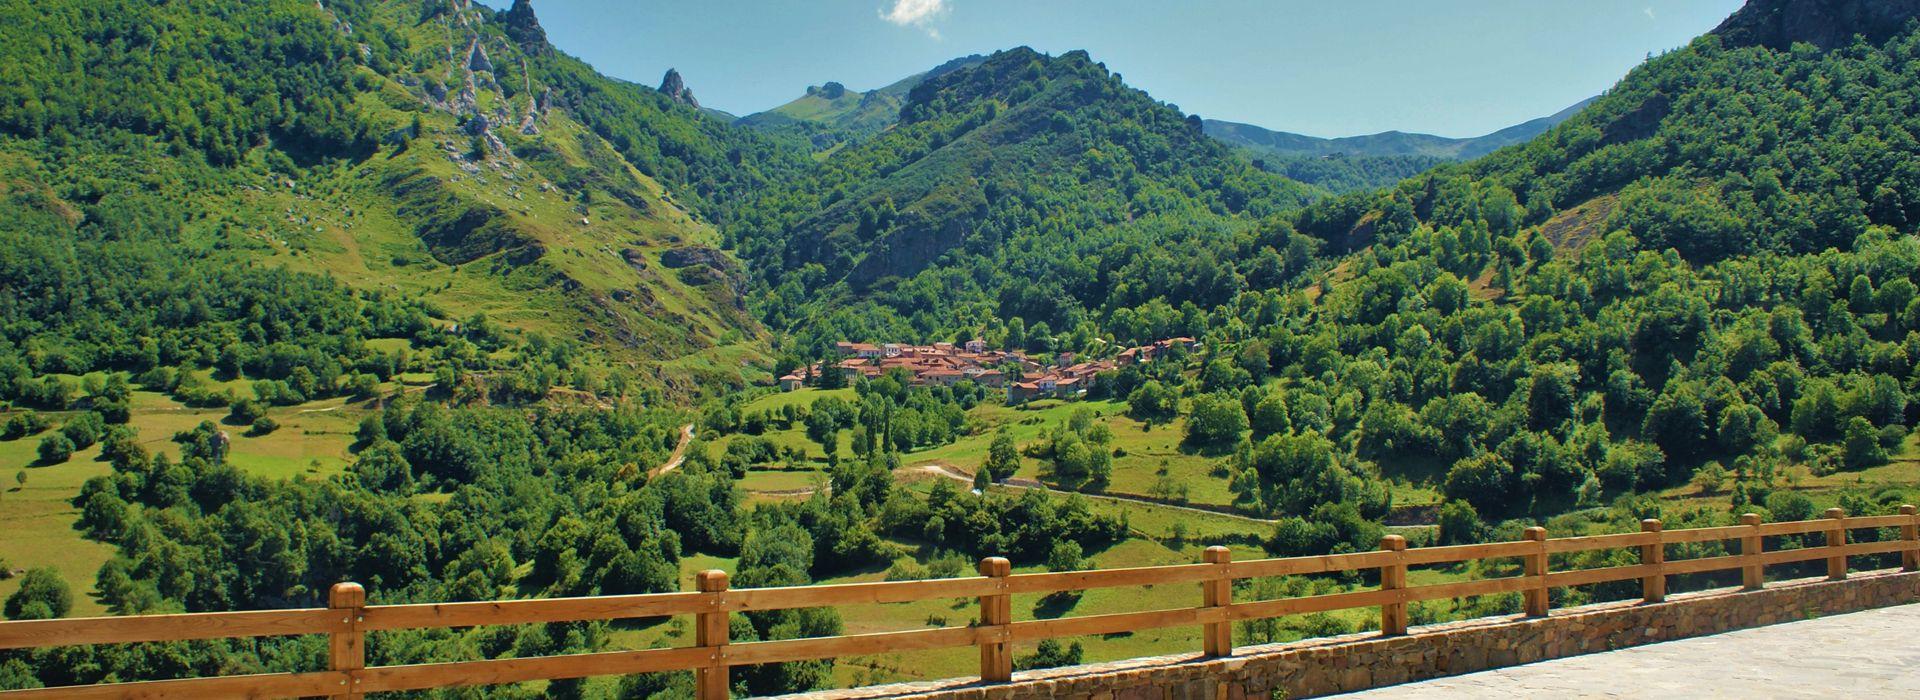 foto-mirador-dobres-cucayo-liebana-turismo-rural